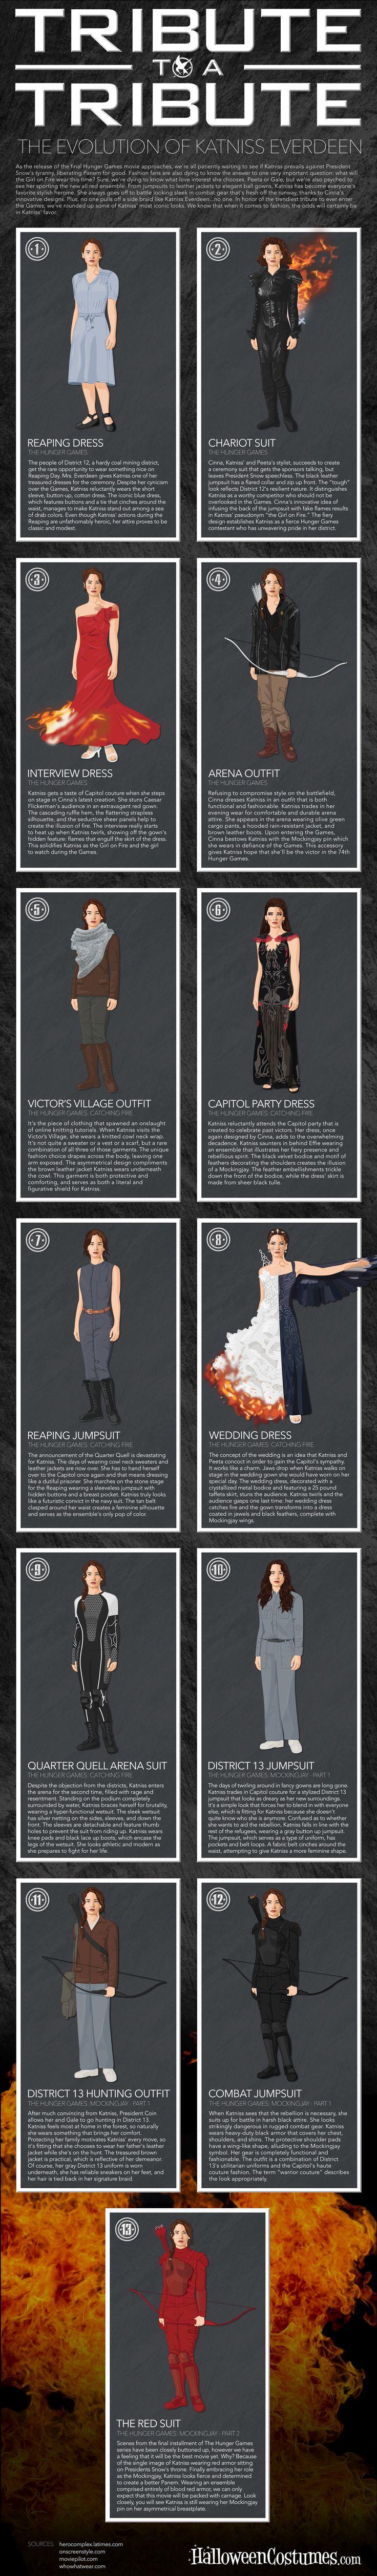 Tribute to a Tribute: The Evolution of Katniss Everdeen [Infographic] #HungerGames #Mockingjay #JenniferLawrence ...repinned für Gewinner!  - jetzt gratis Erfolgsratgeber sichern www.ratsucher.de